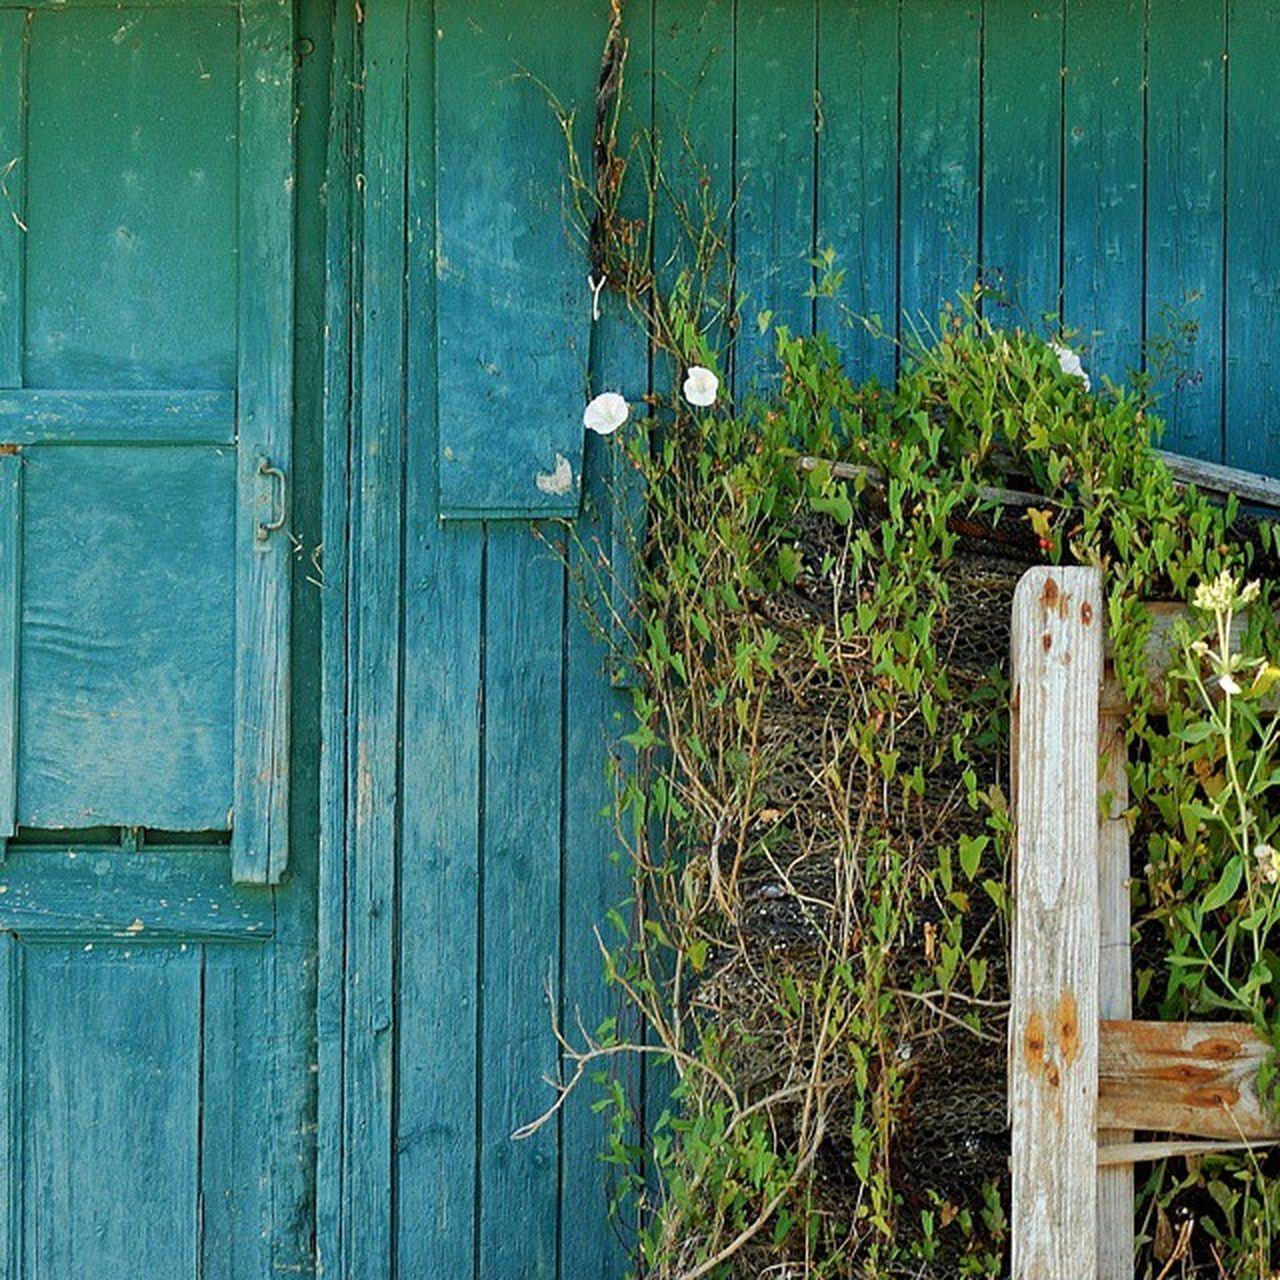 Cabane ostréicole Saintrojanlesbains Cabanesostreicoles Oleron Charantemaritime bleu vert